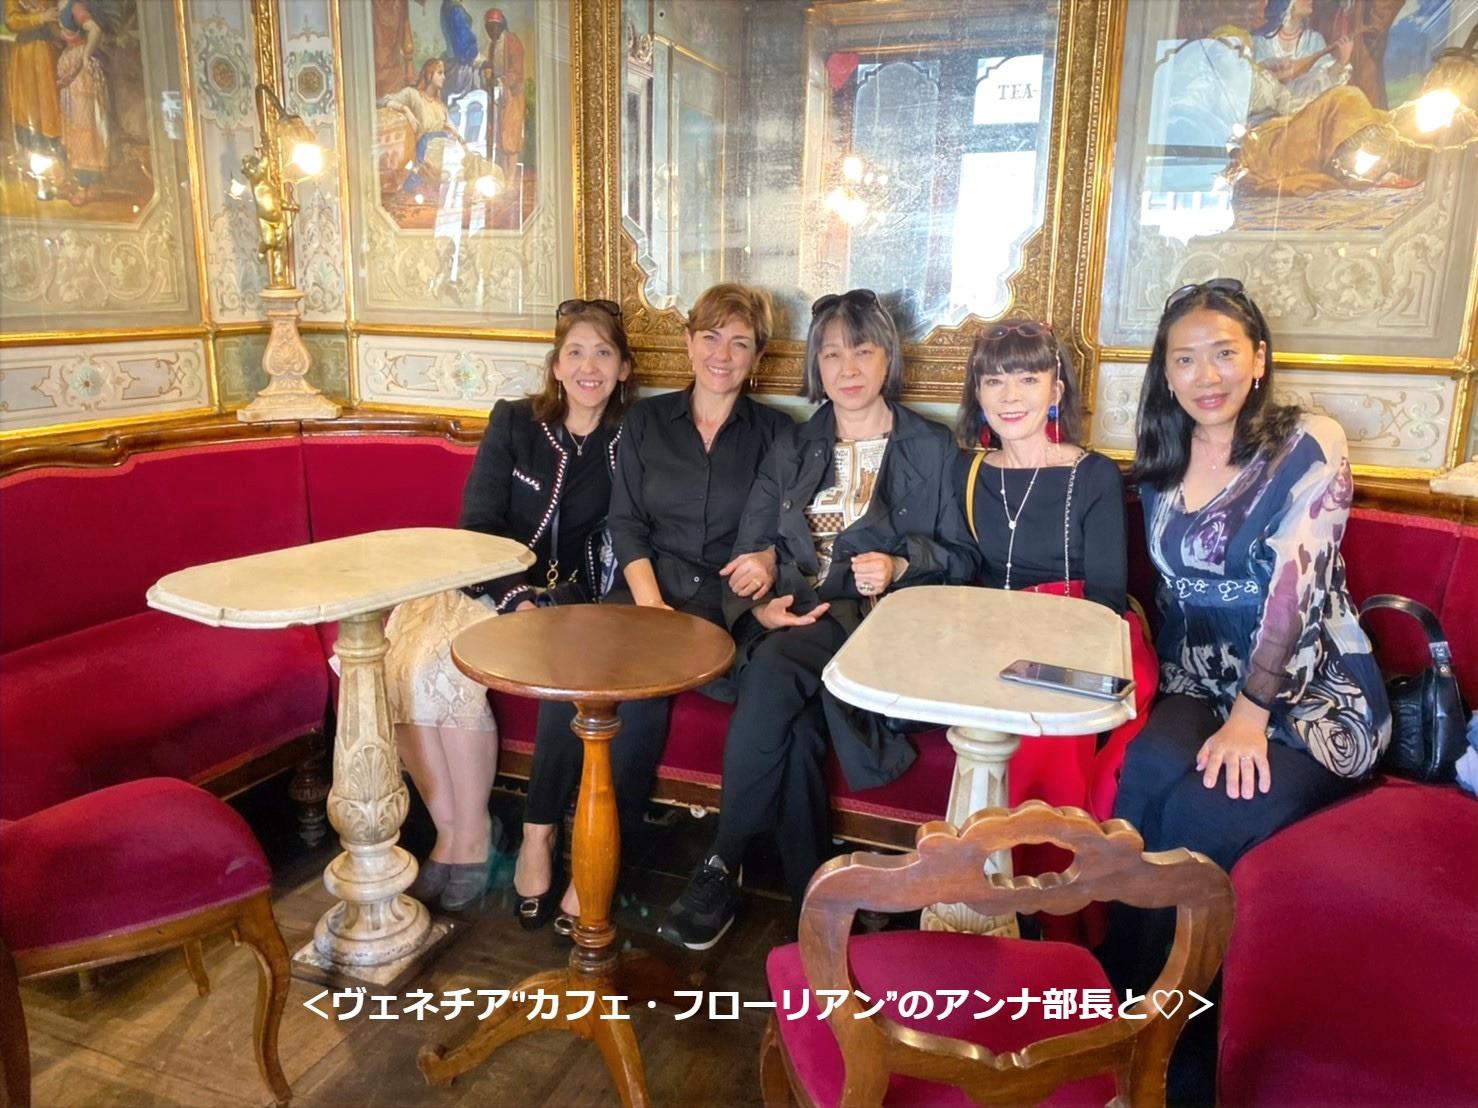 cafe florian_edited.jpg